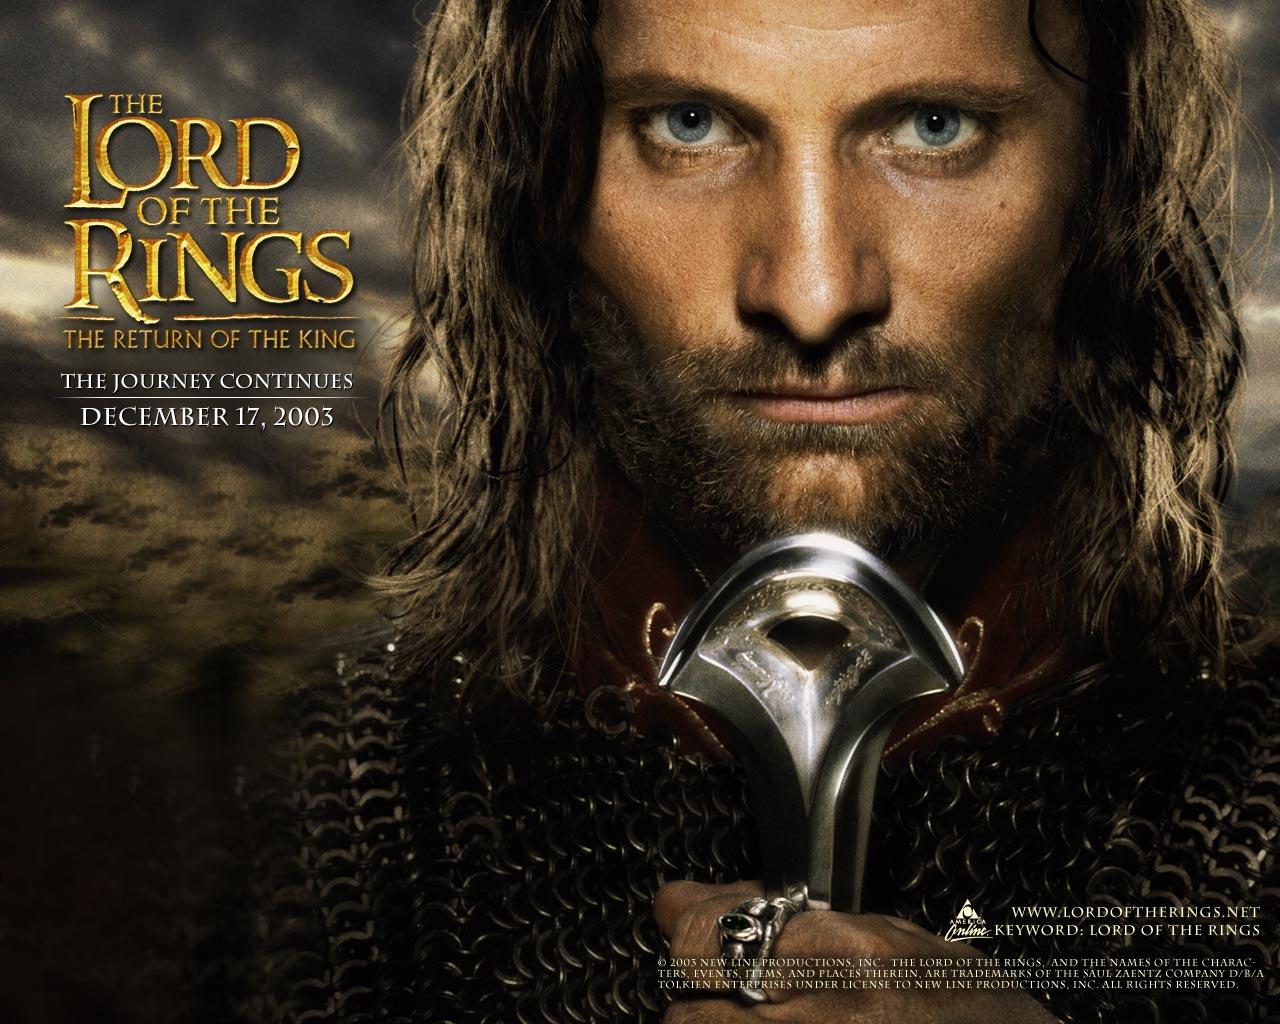 http://3.bp.blogspot.com/_mhh6YCcl_j4/TFQAaCU4LQI/AAAAAAAAAIw/zc9cvUK1anQ/s1600/Viggo_Mortensen_in_The_Lord_of_the_Rings-_The_Return_of_the_King_Wallpaper_3_1280.jpg